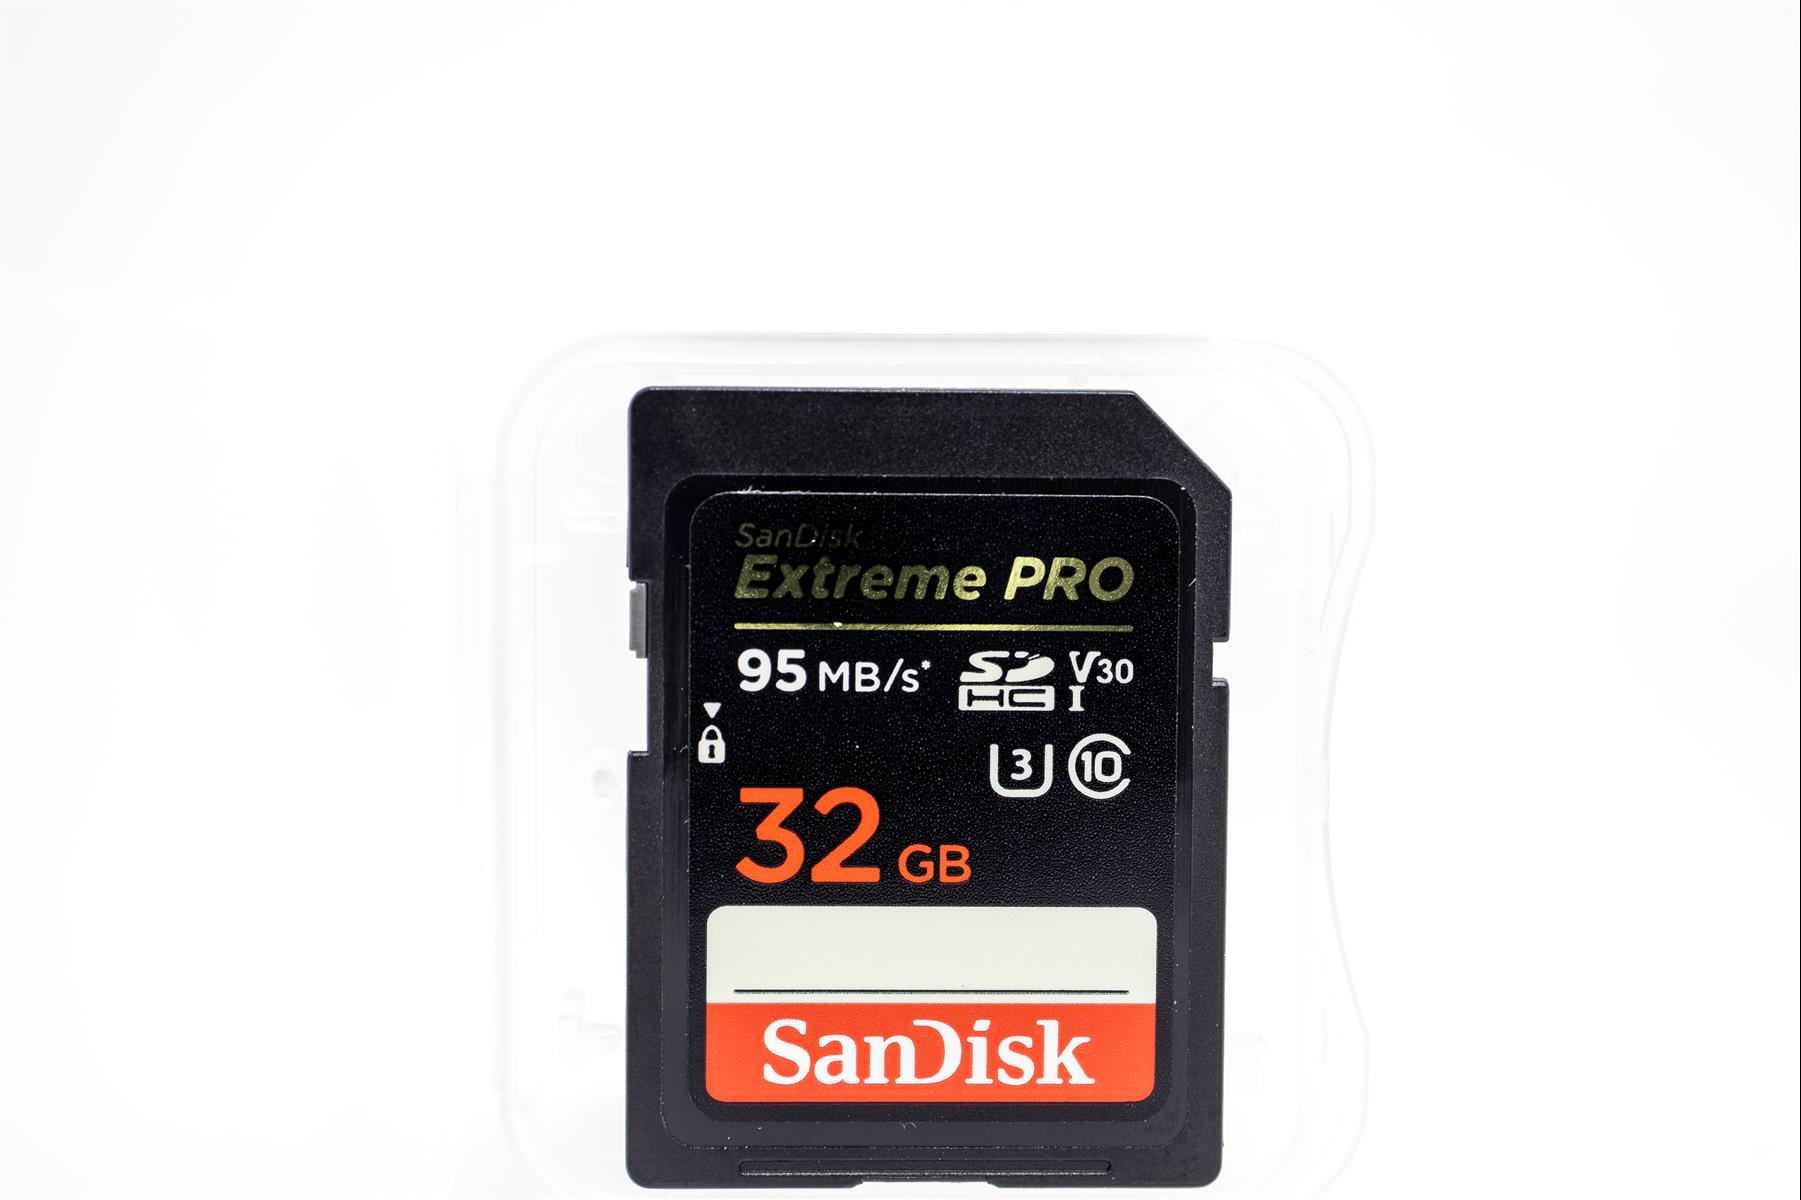 SanDisk Extreme PRO SDHC UHS-I 32G